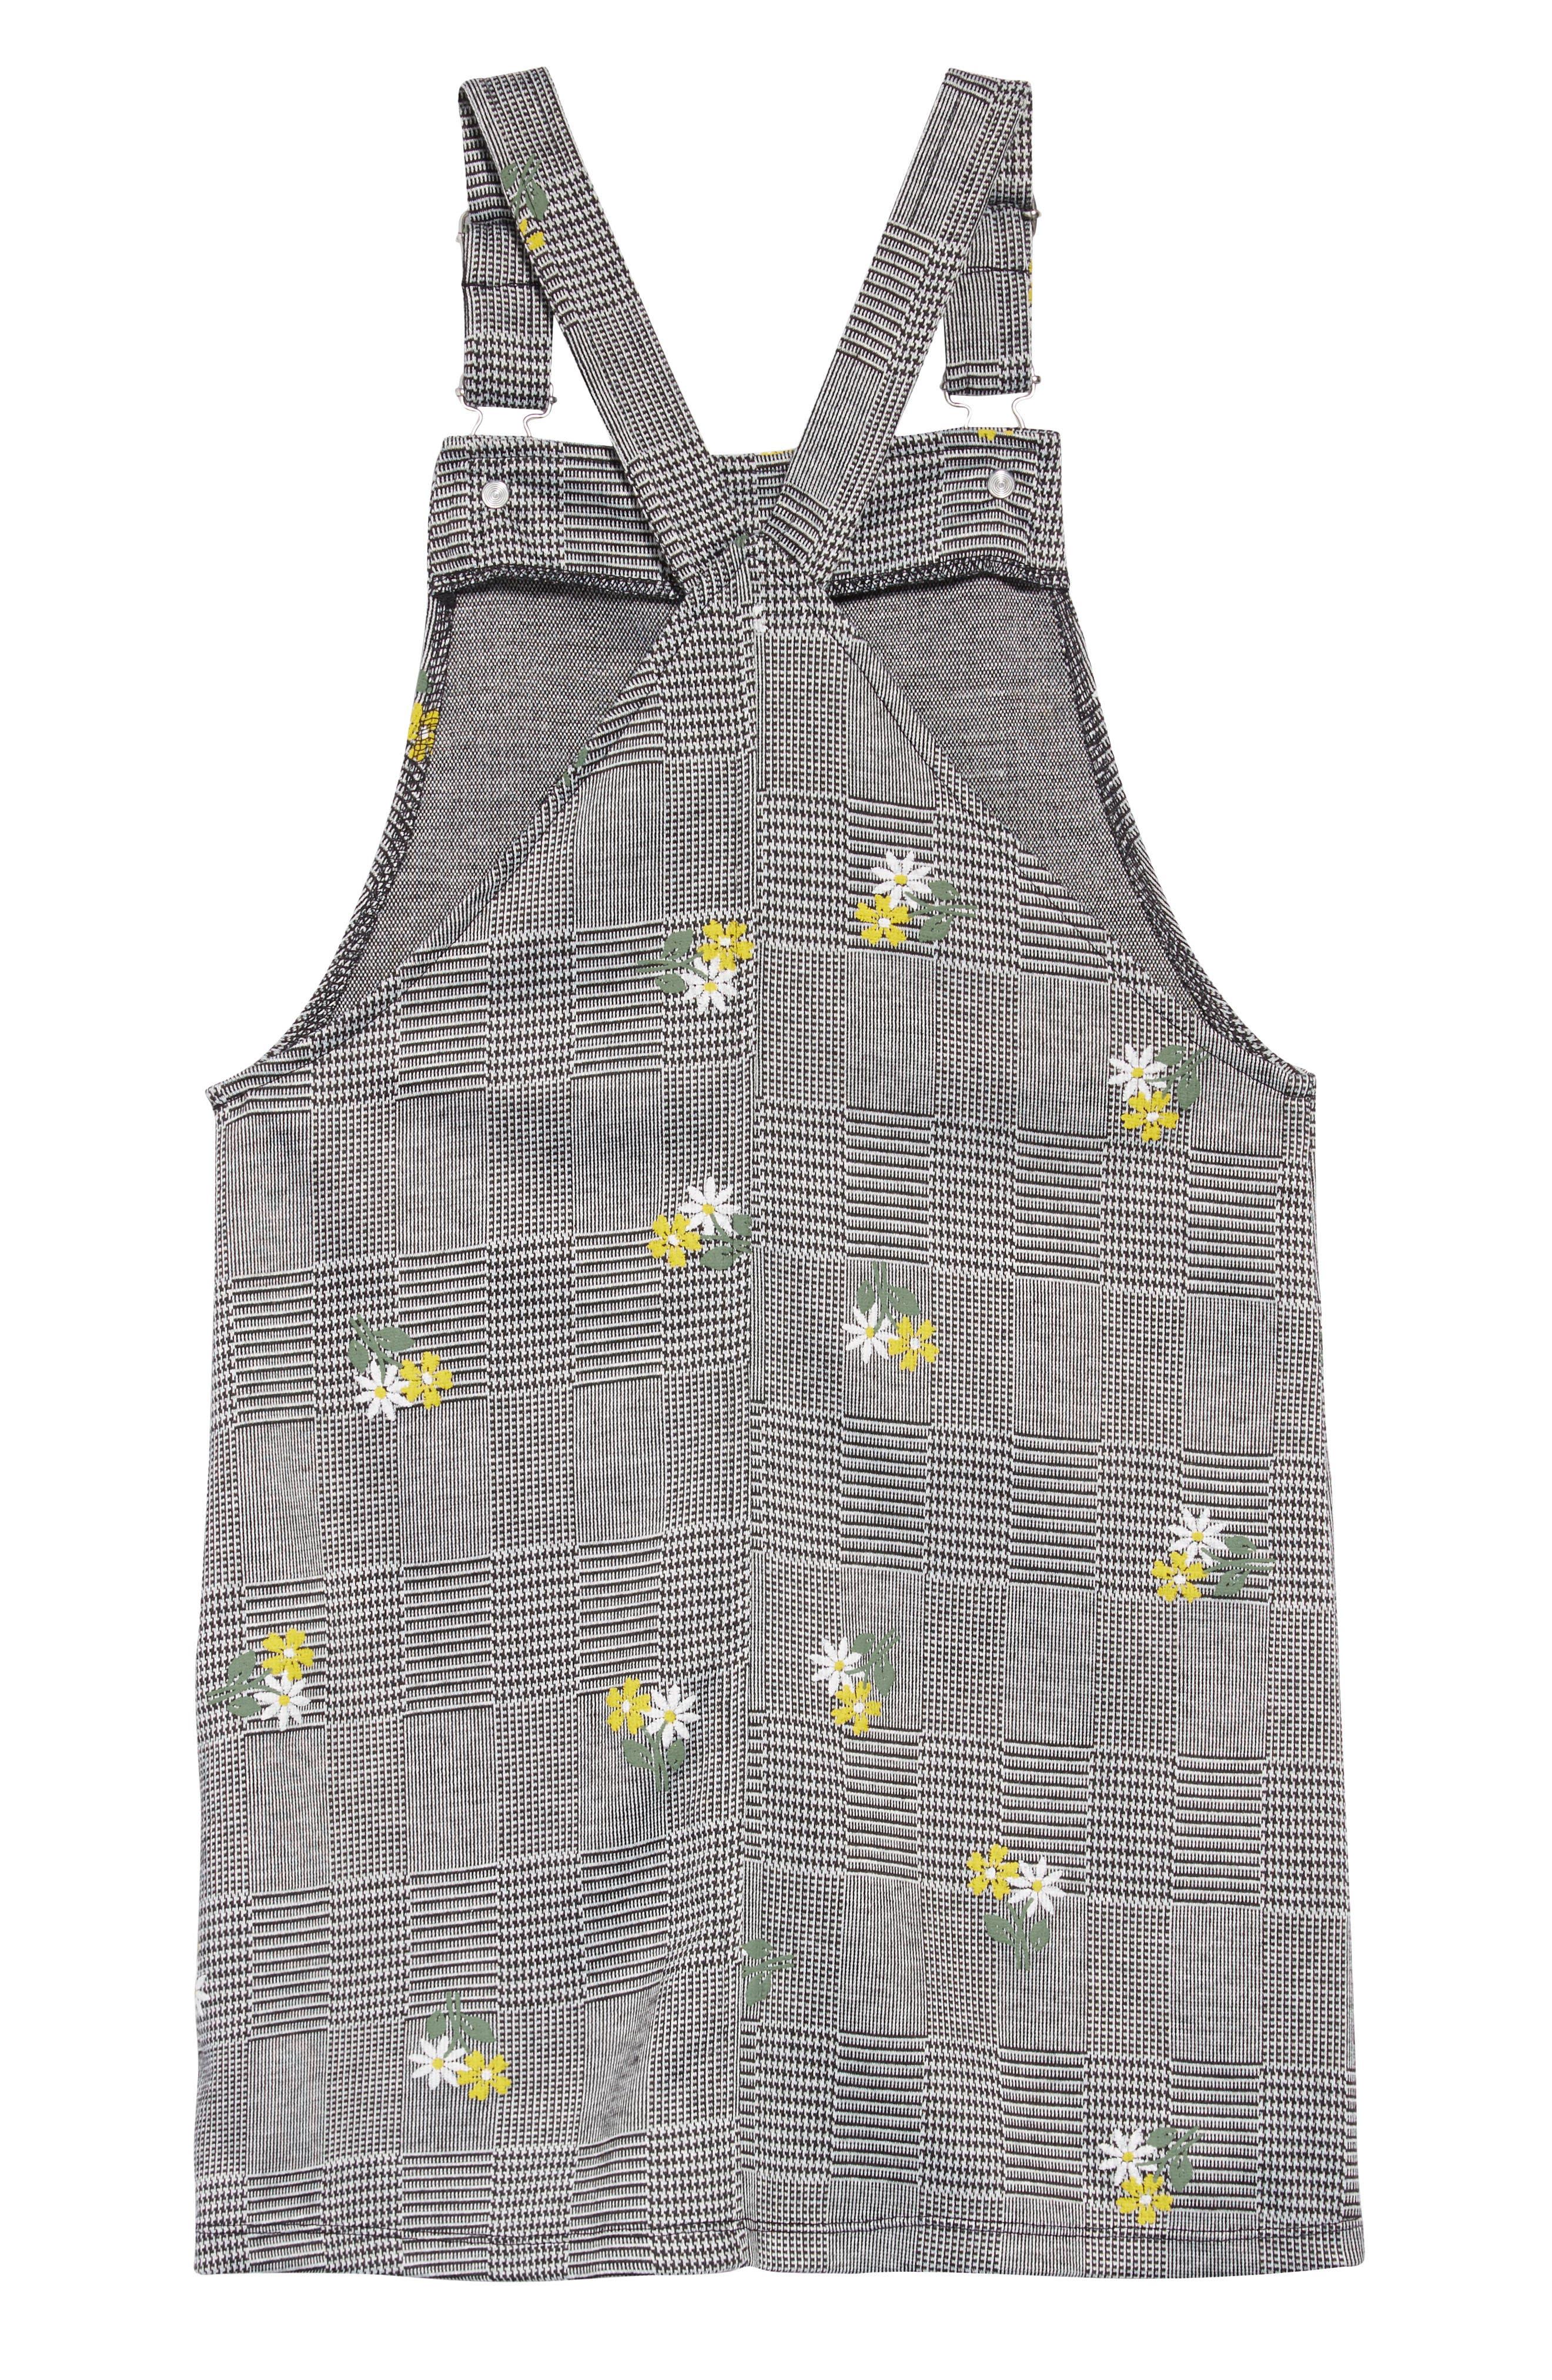 Embroidered Plaid Jumper,                             Alternate thumbnail 2, color,                             BLACK/ WHITE PLAID